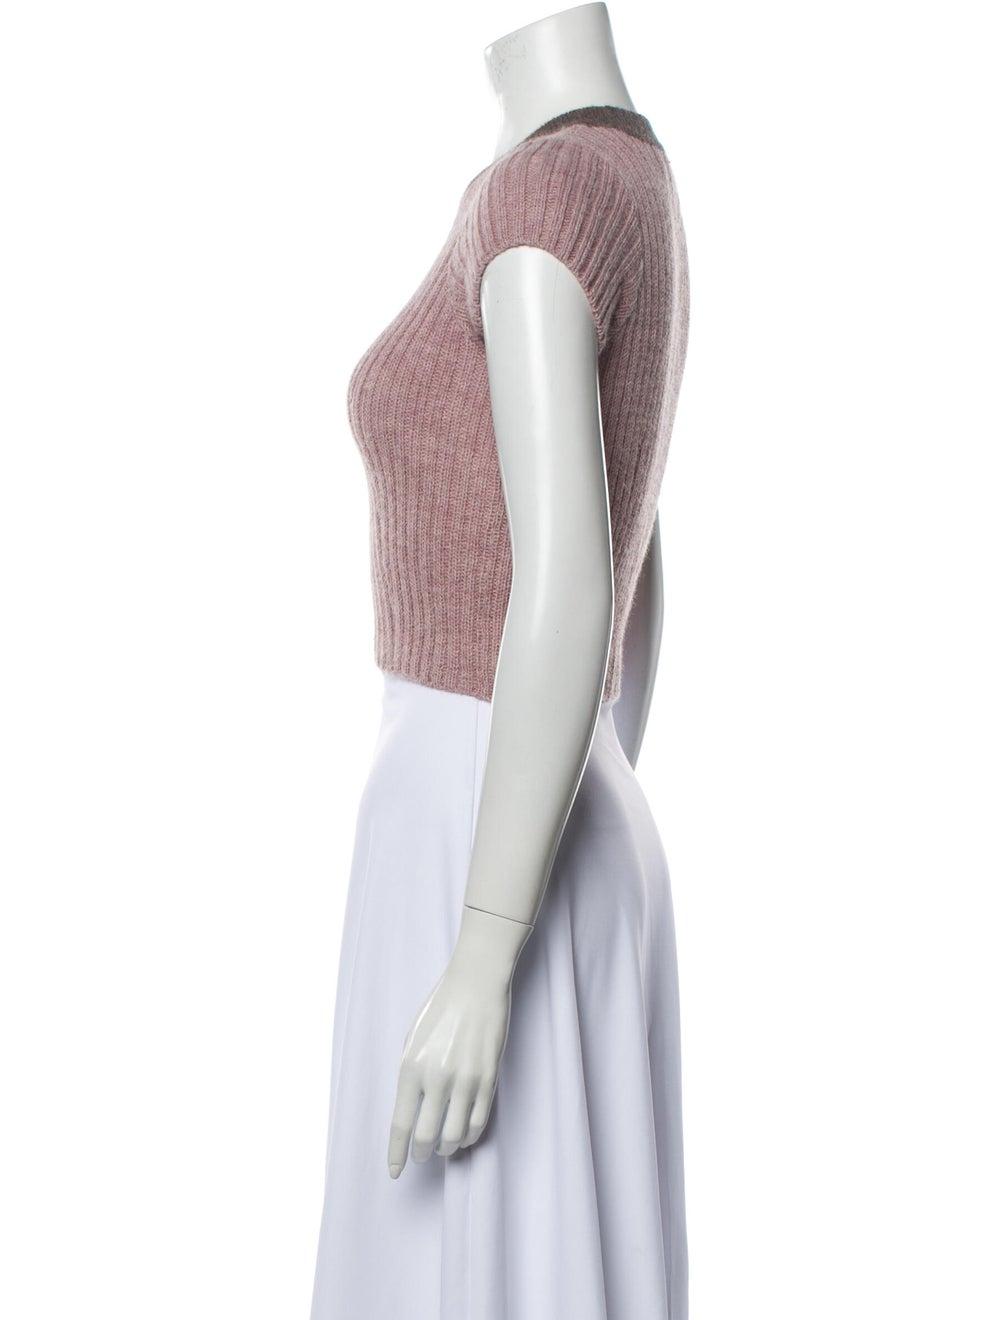 Eckhaus Latta Alpaca Crew Neck Sweater Pink - image 2